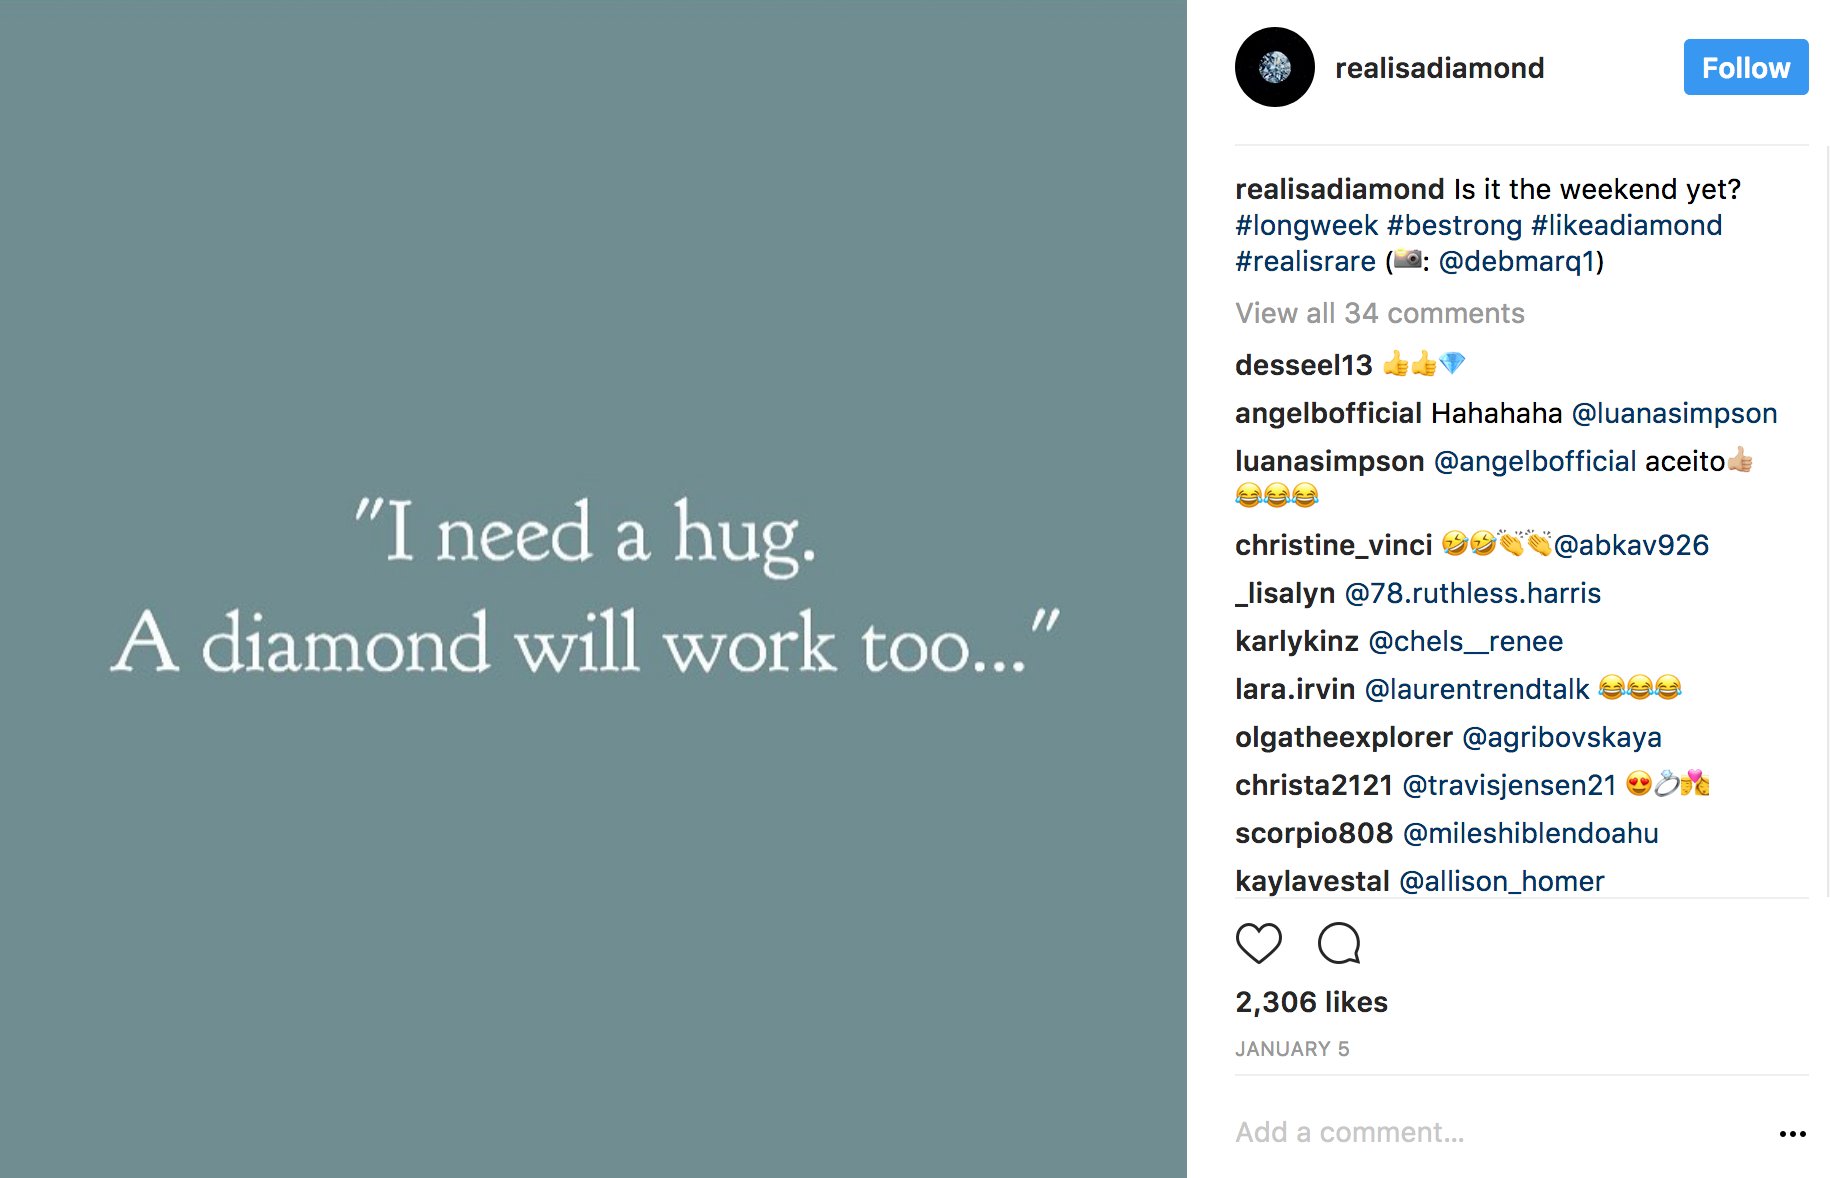 Realisadiamond Instagram hugs and diamonds